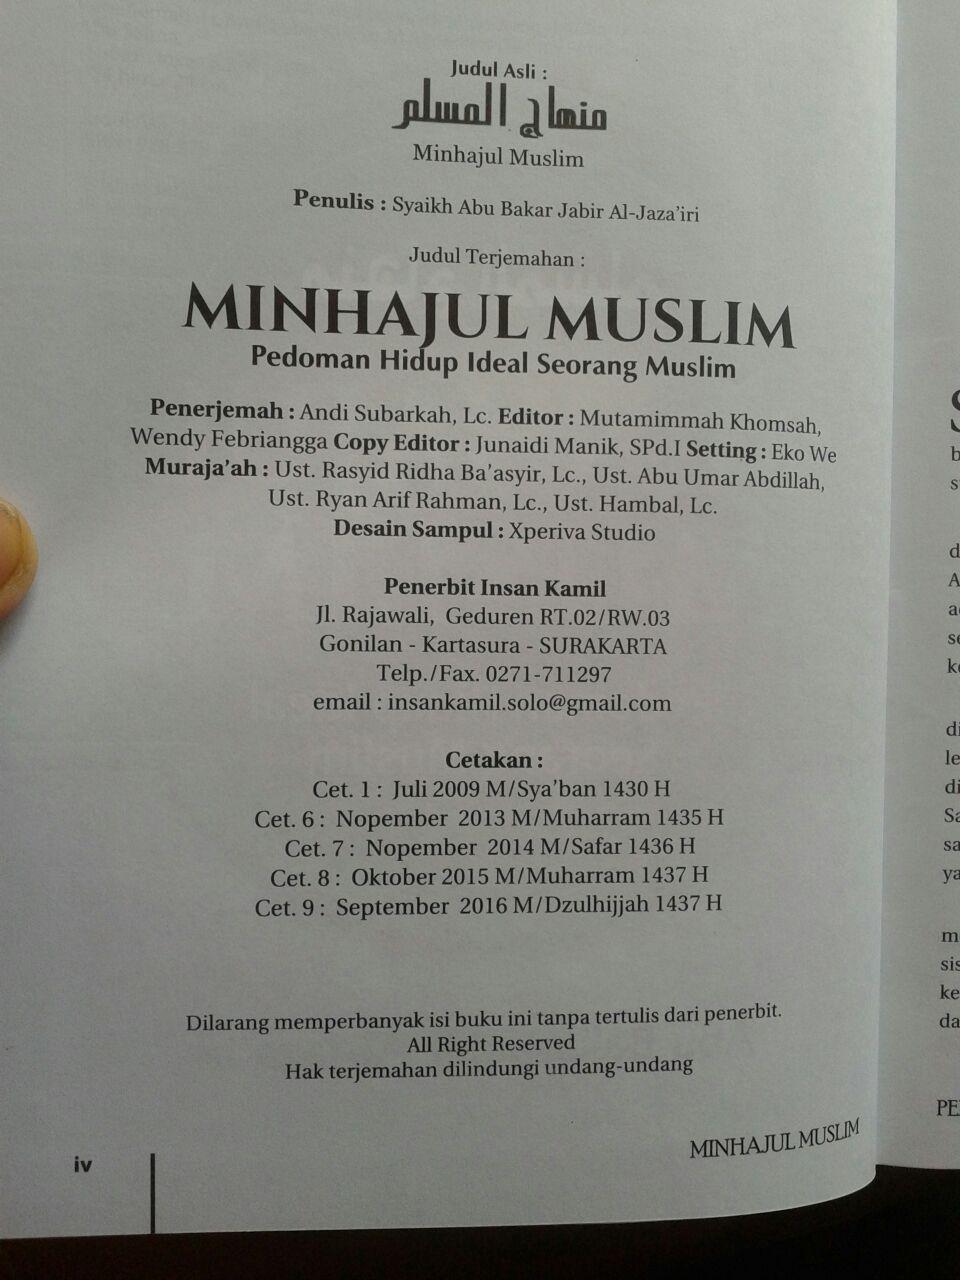 Buku Minhajul Muslim Pedoman Hidup Ideal Seorang Muslim isi 6